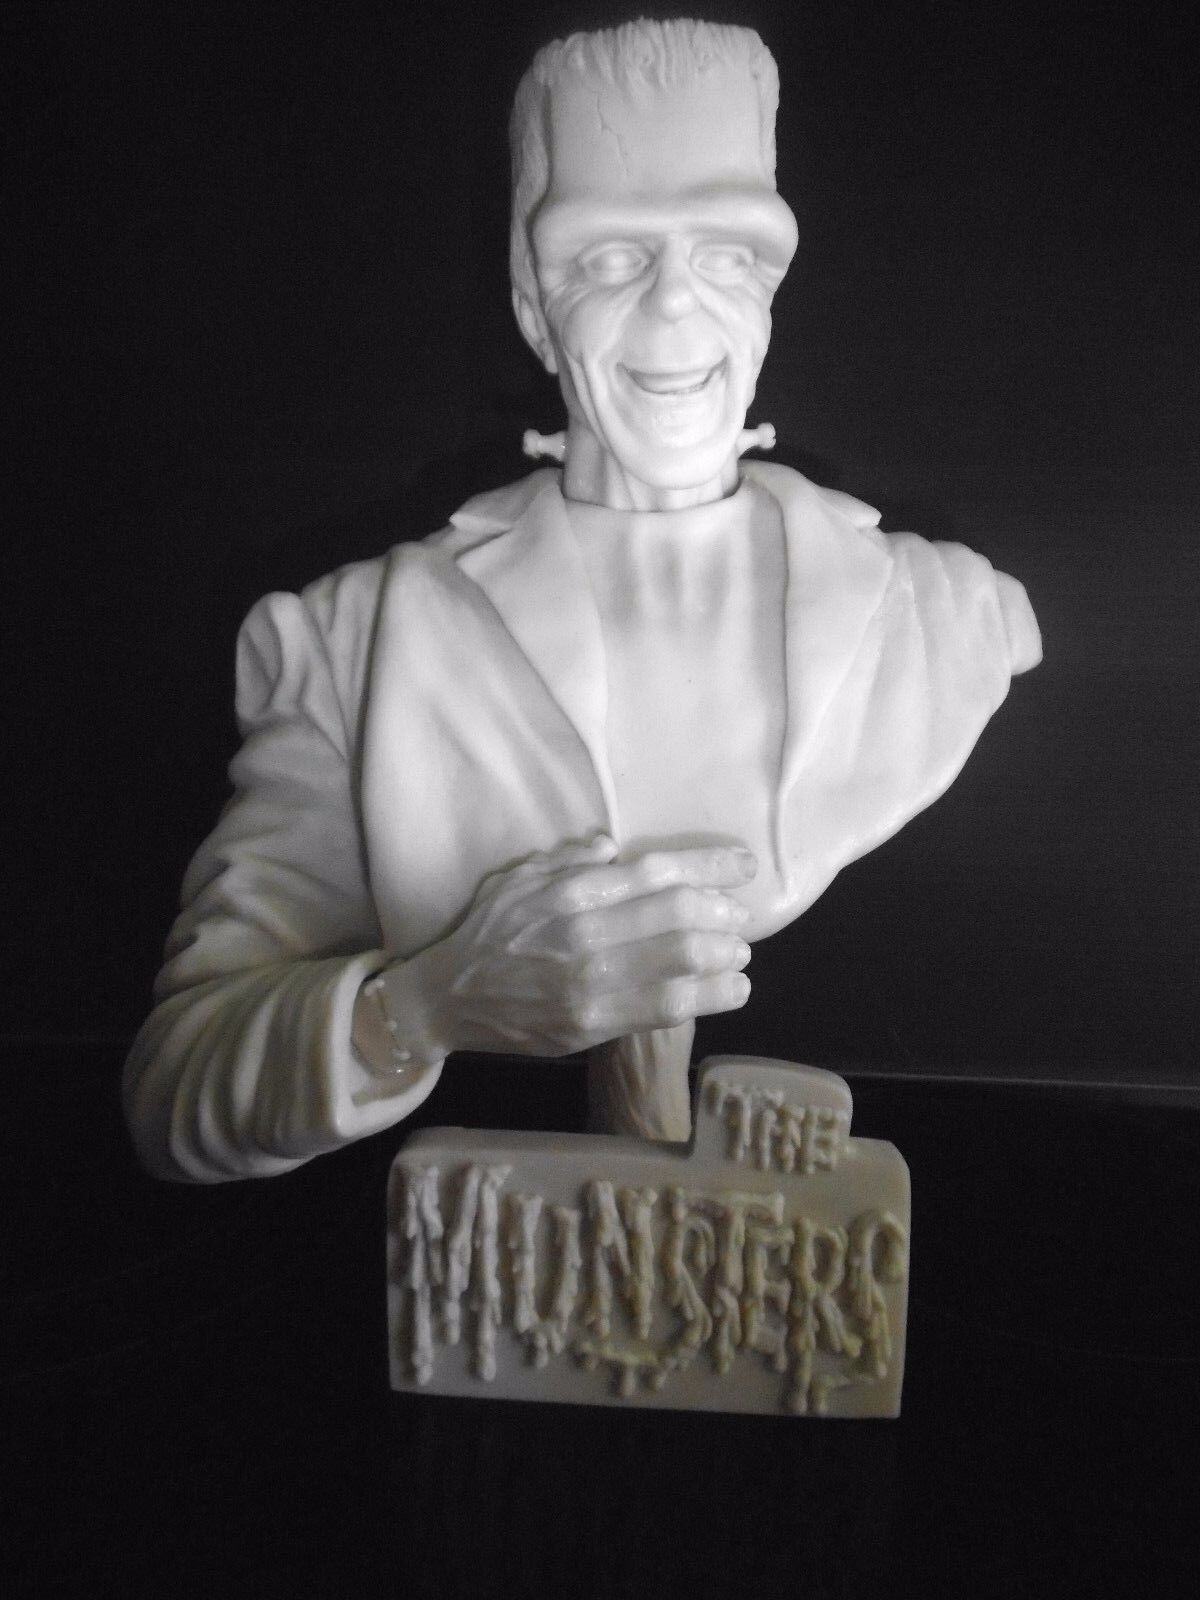 THE MUNSTERS.Herman Munster.resin bust .unpainted.